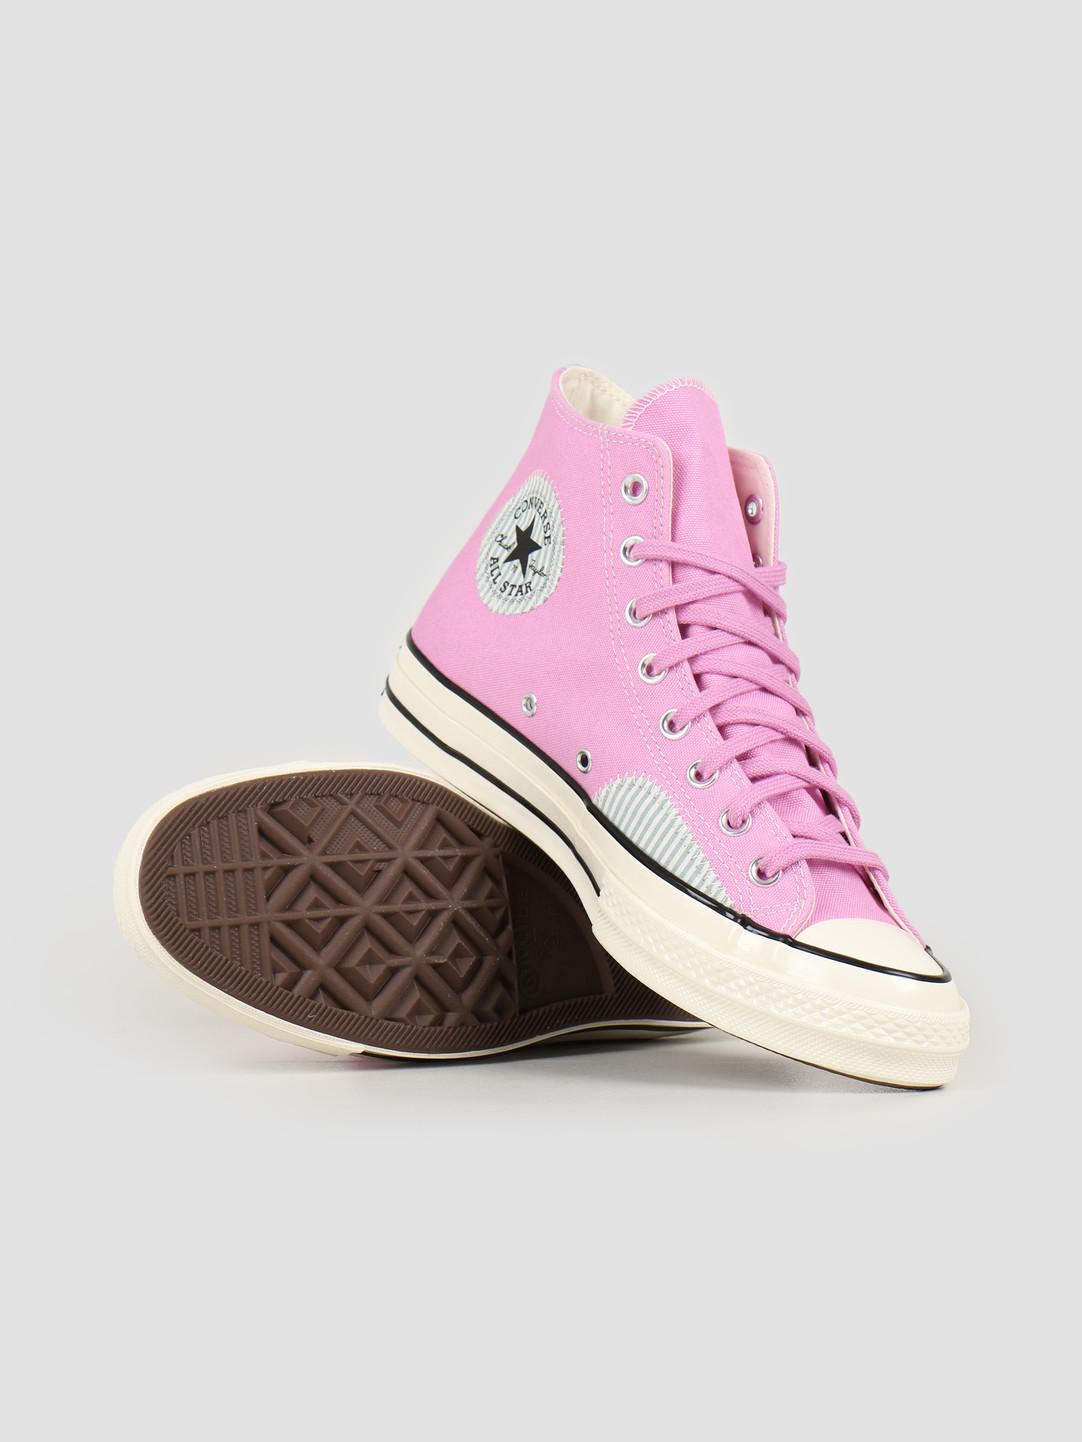 Converse Converse Chuck 70 Hi Peony Pink Mineral Teal 167071C